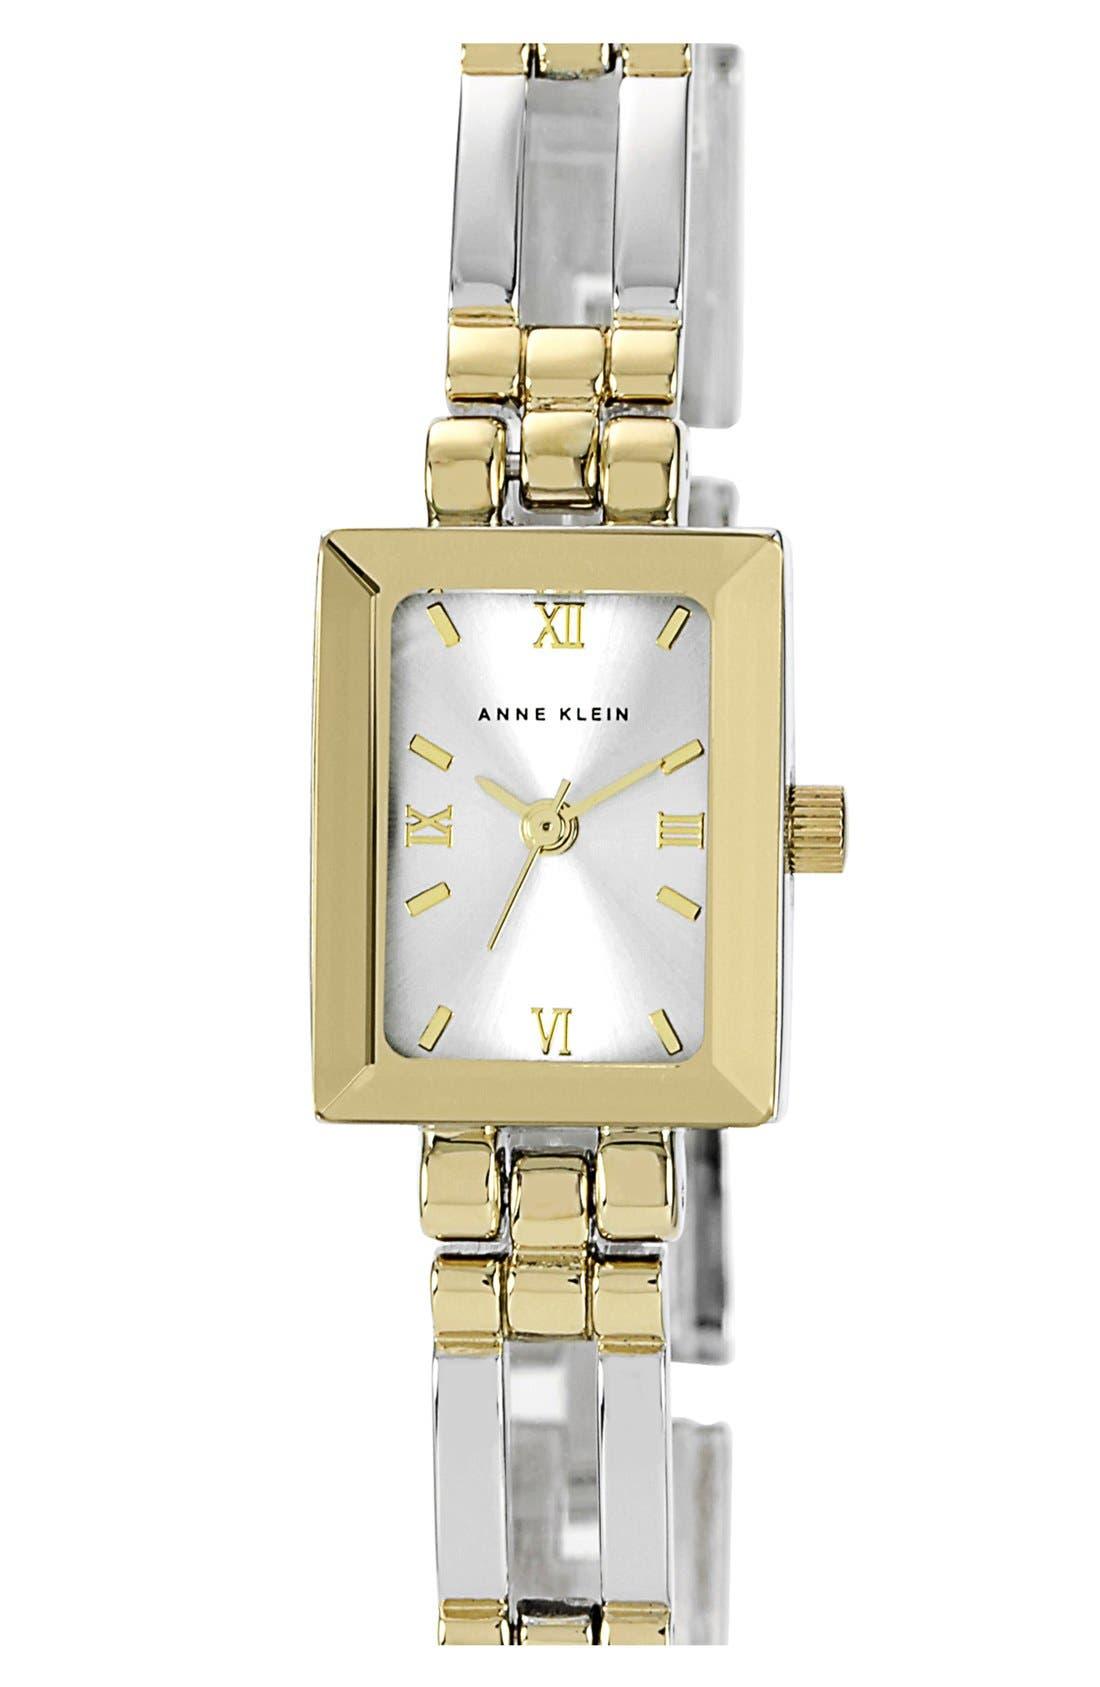 Main Image - Anne Klein Square Case Bracelet Watch, 12mm x 16mm